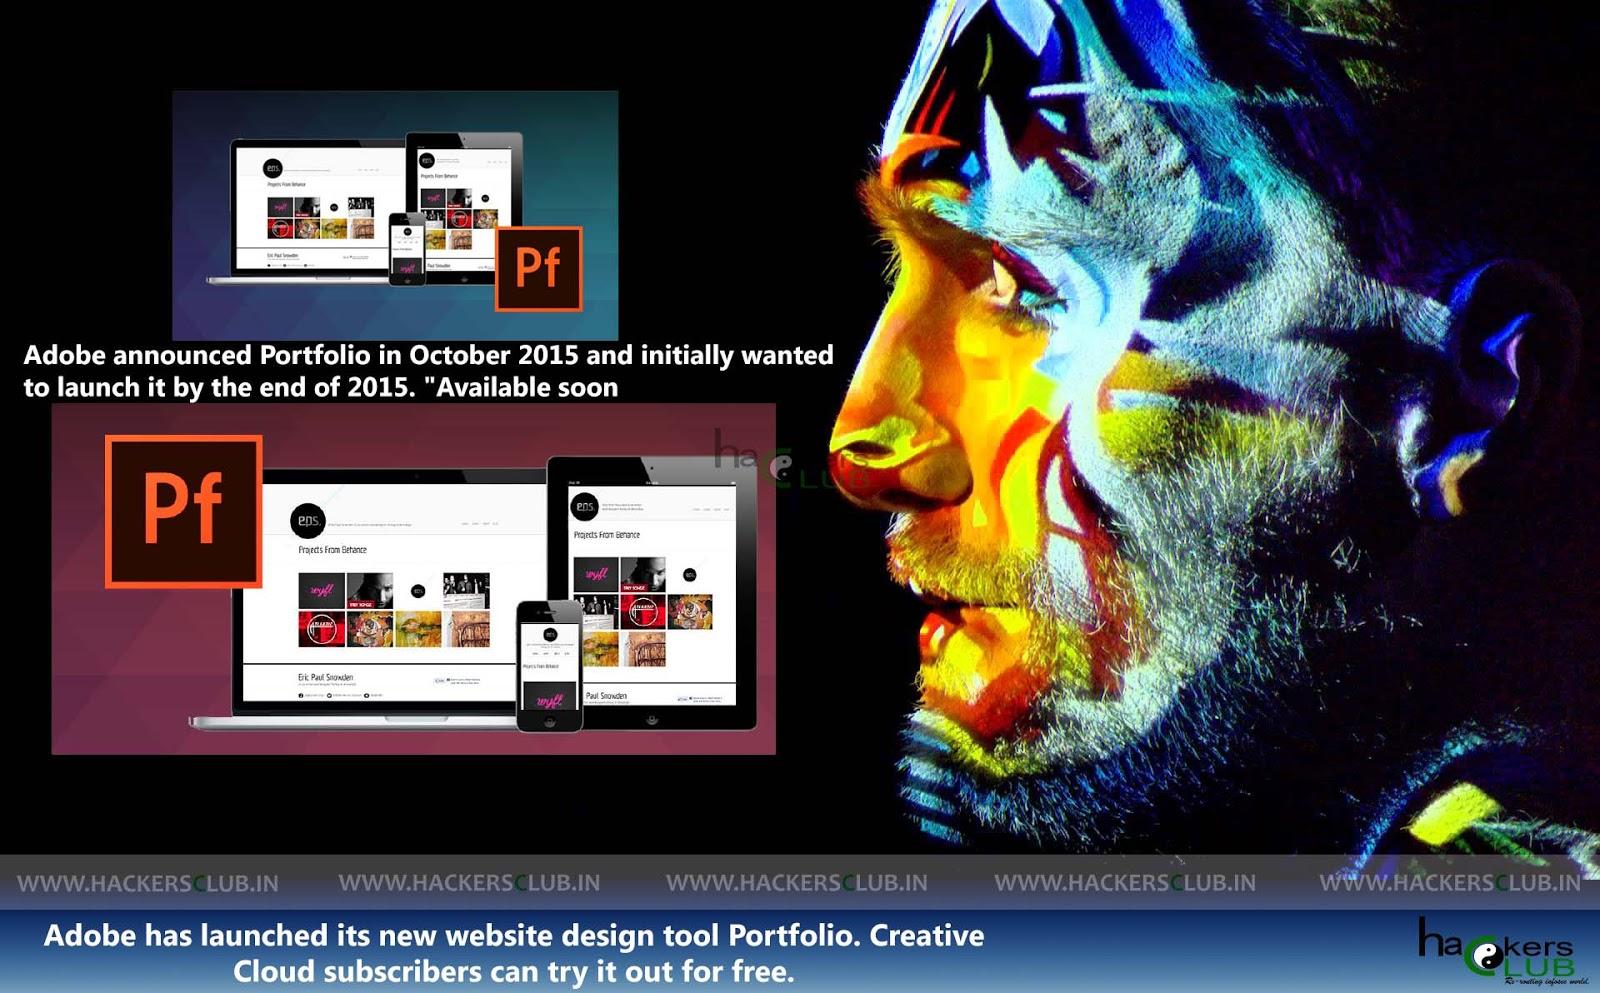 Adobe Portfolio Website Design Tool Now Available To Creative ...